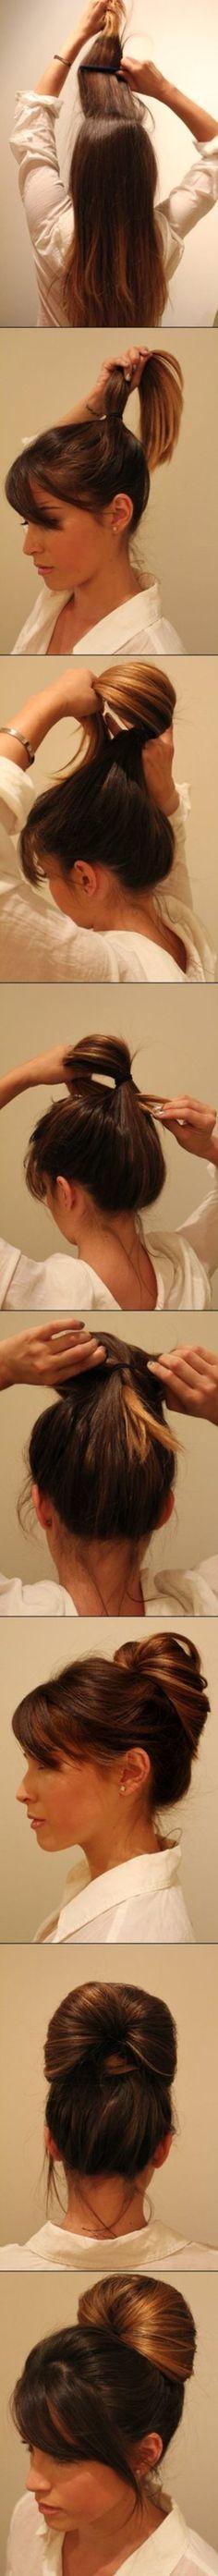 Easy Updo in seconds #updo #hairstyle #hair #bun #tutorial - bellashoot.com